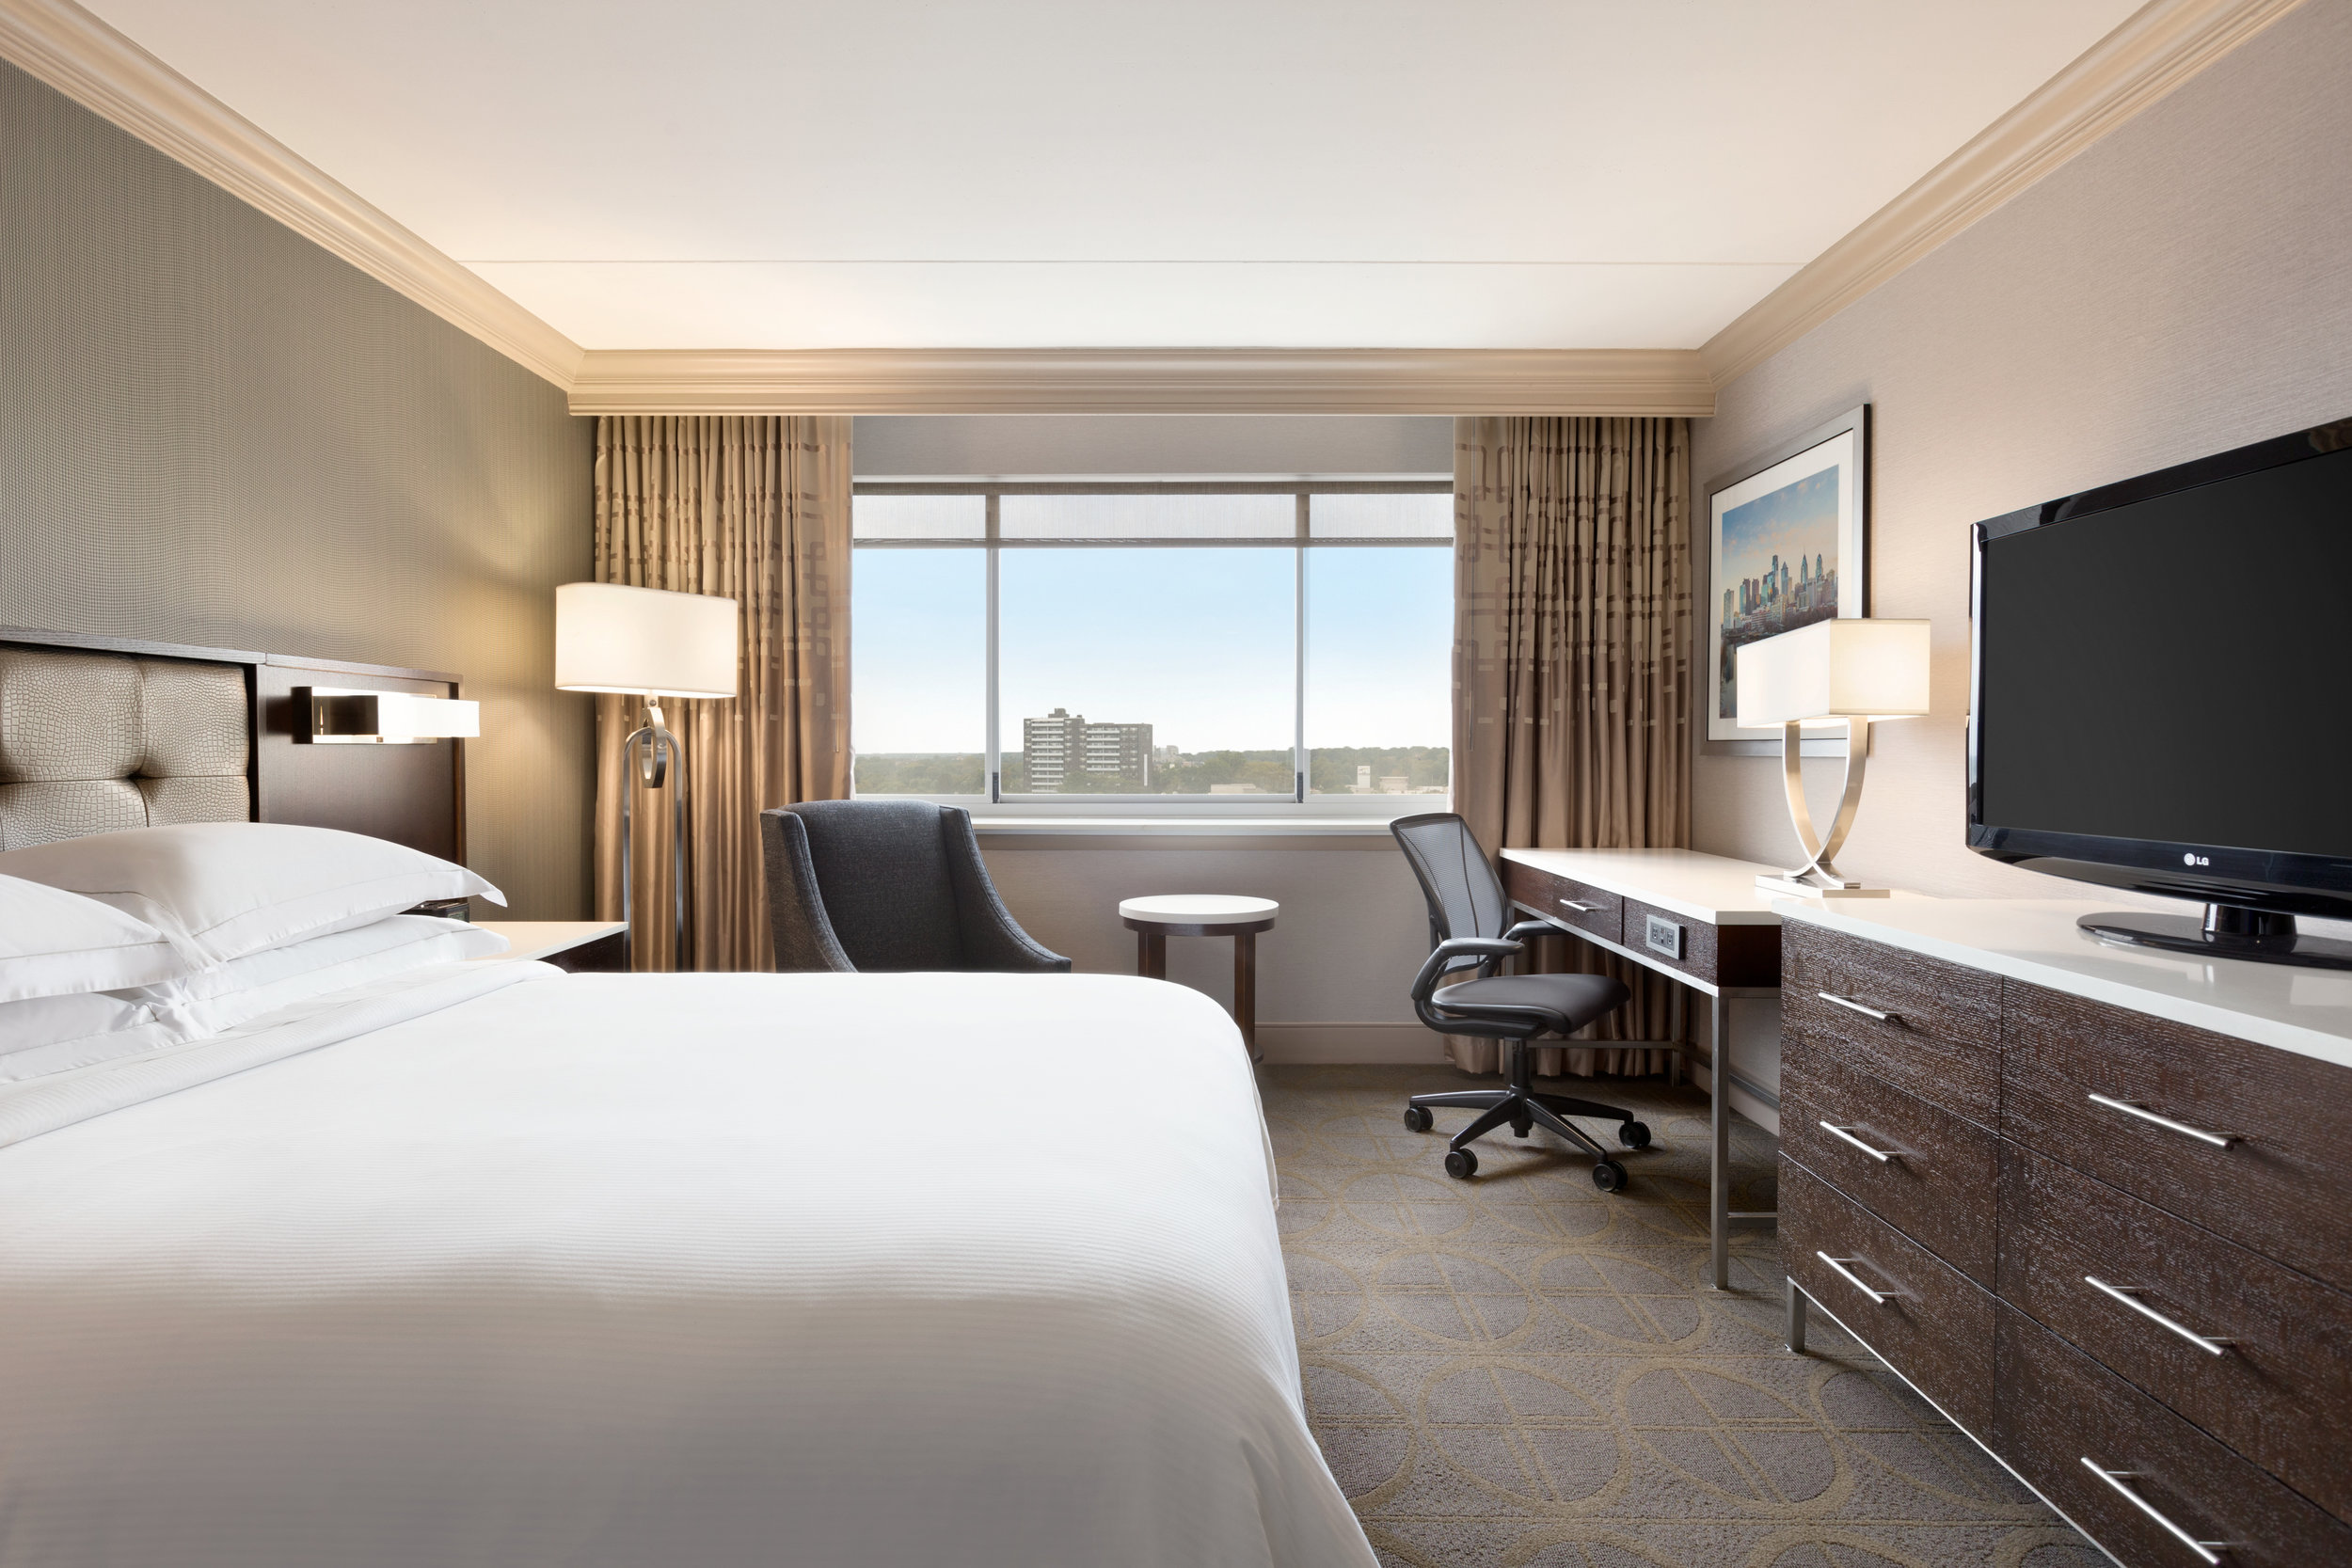 Hilton Philadelphia City Avenue - 1 Queen Guest Room - 1168320 copy.jpg